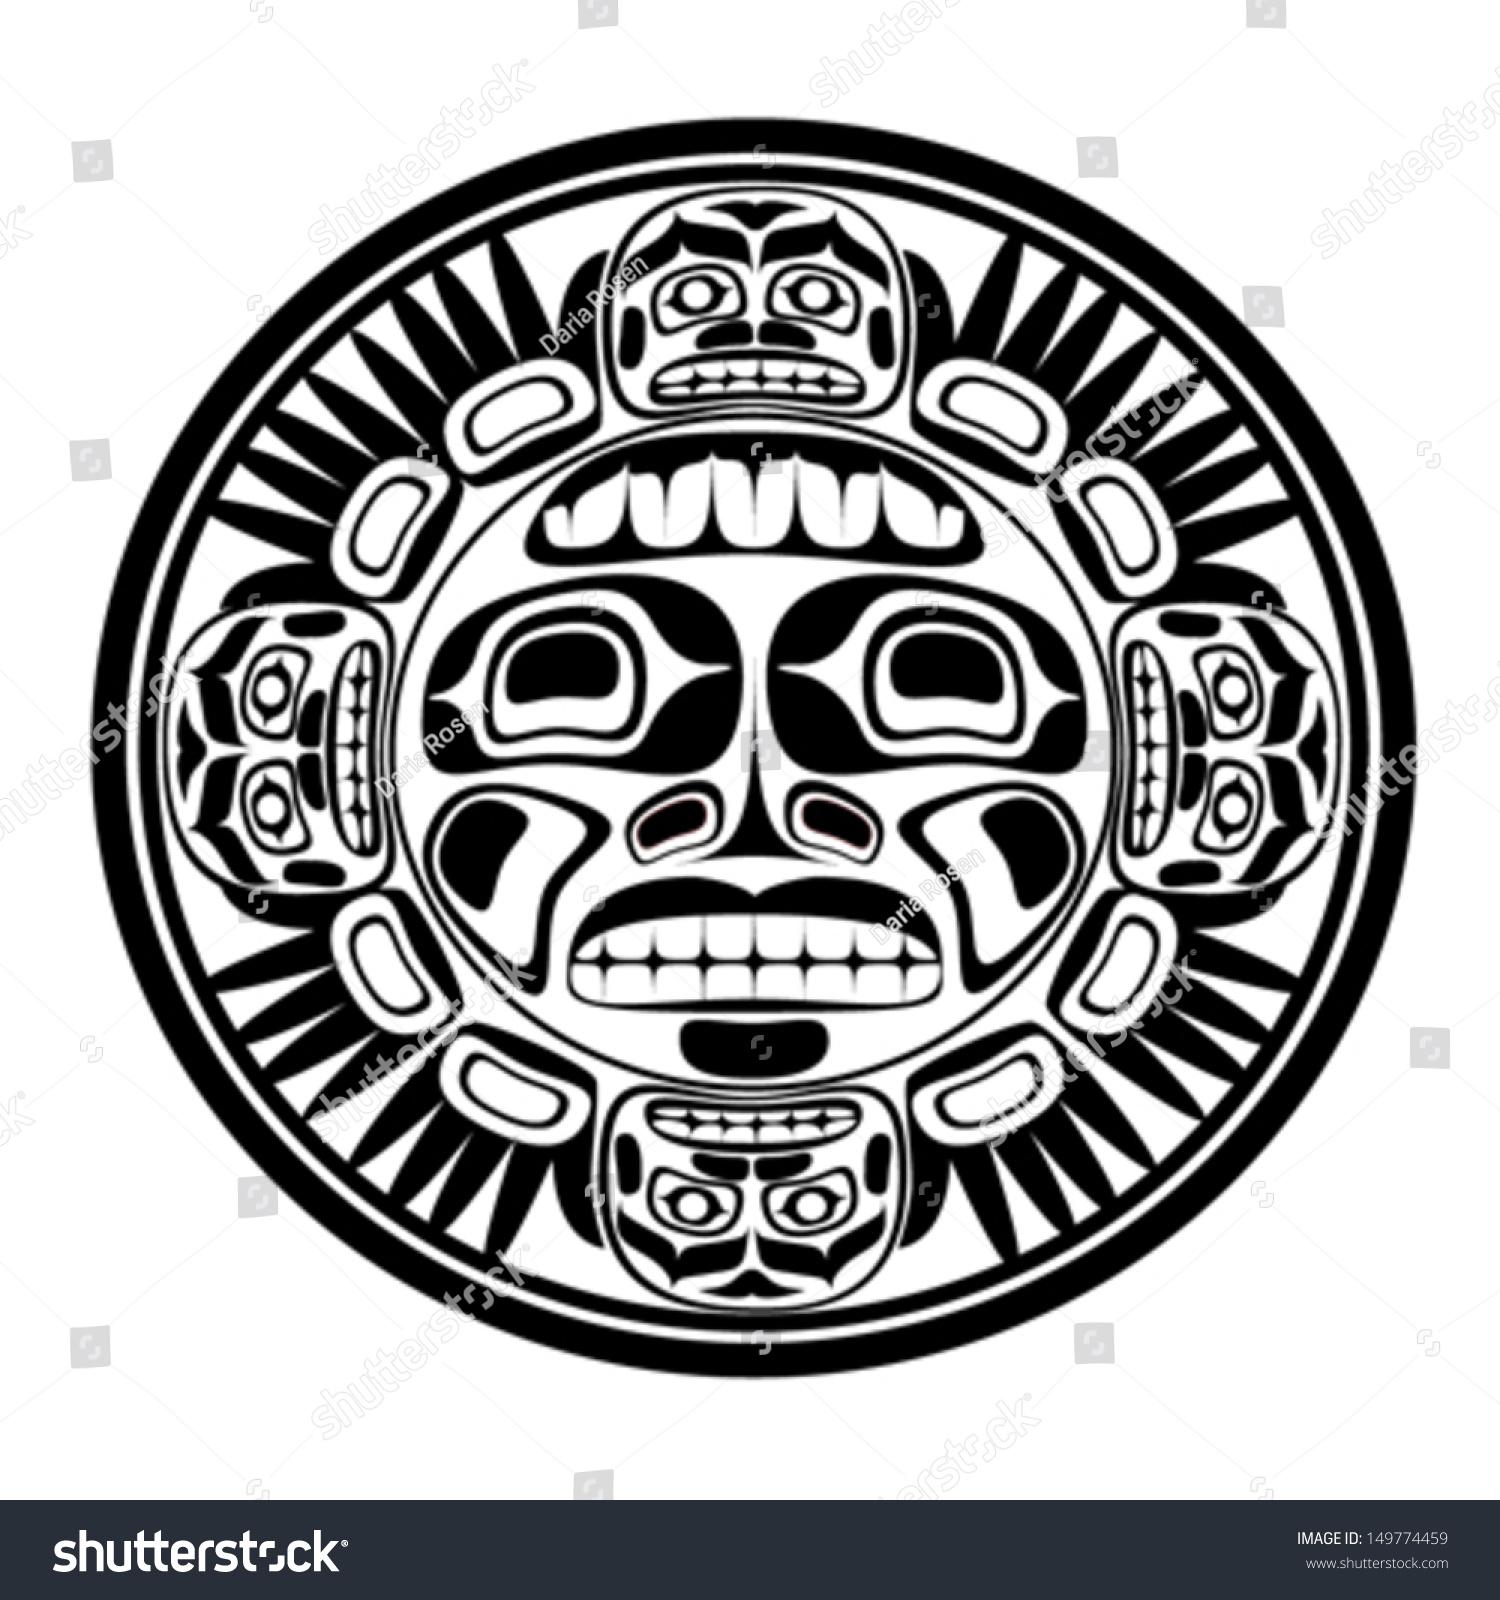 Vector illustration sun symbol modern stylization stock vector vector illustration of the sun symbol modern stylization of north american and canadian native art biocorpaavc Images